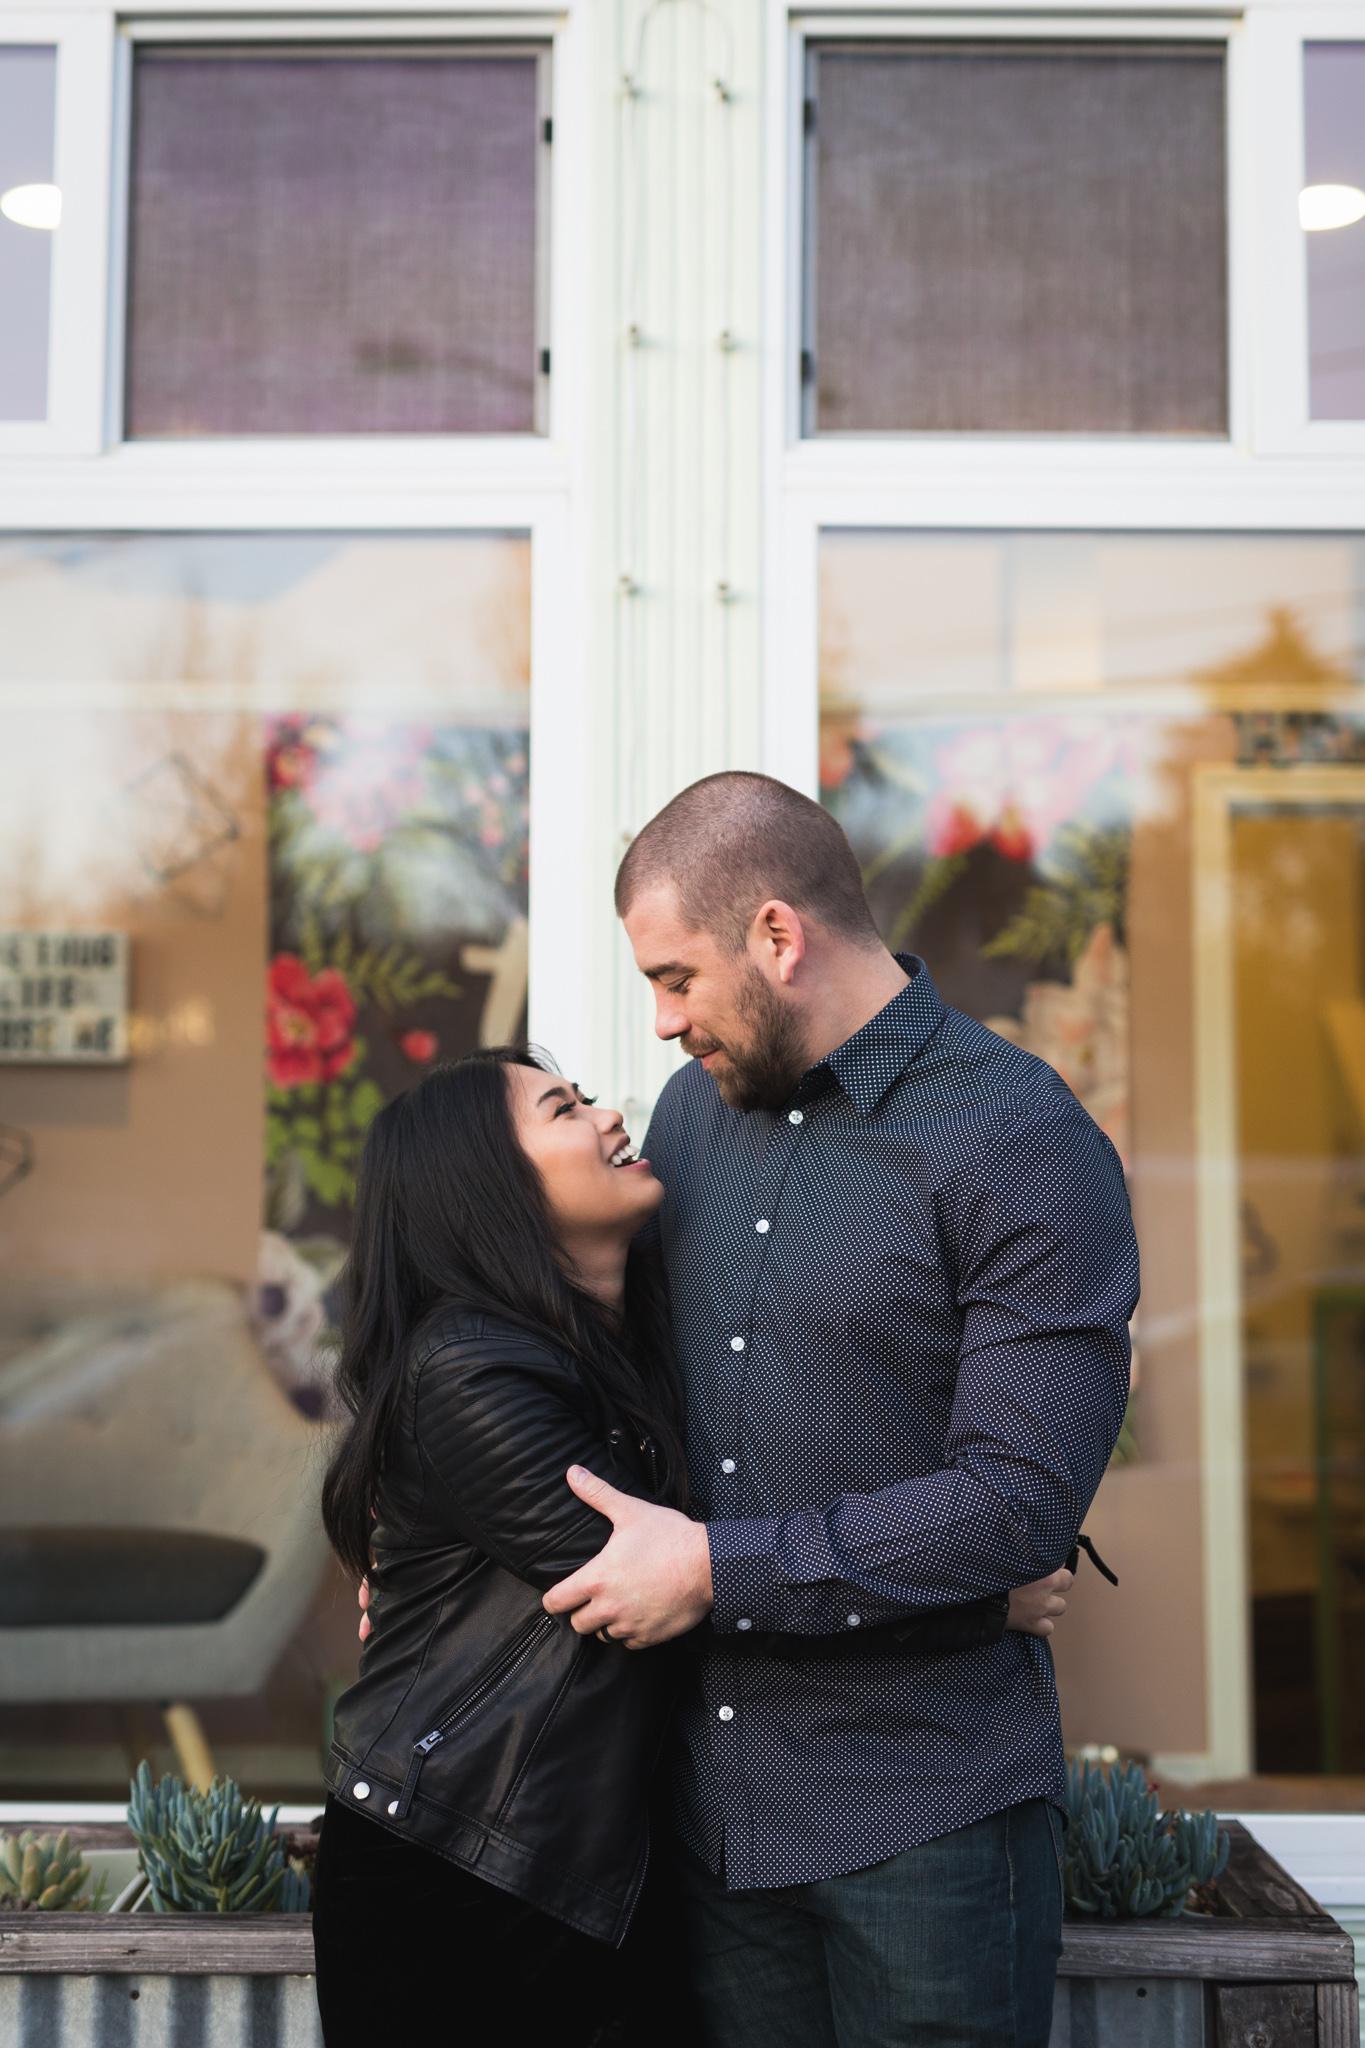 LucyTony-2018-Rosario-Engagement-48.jpg